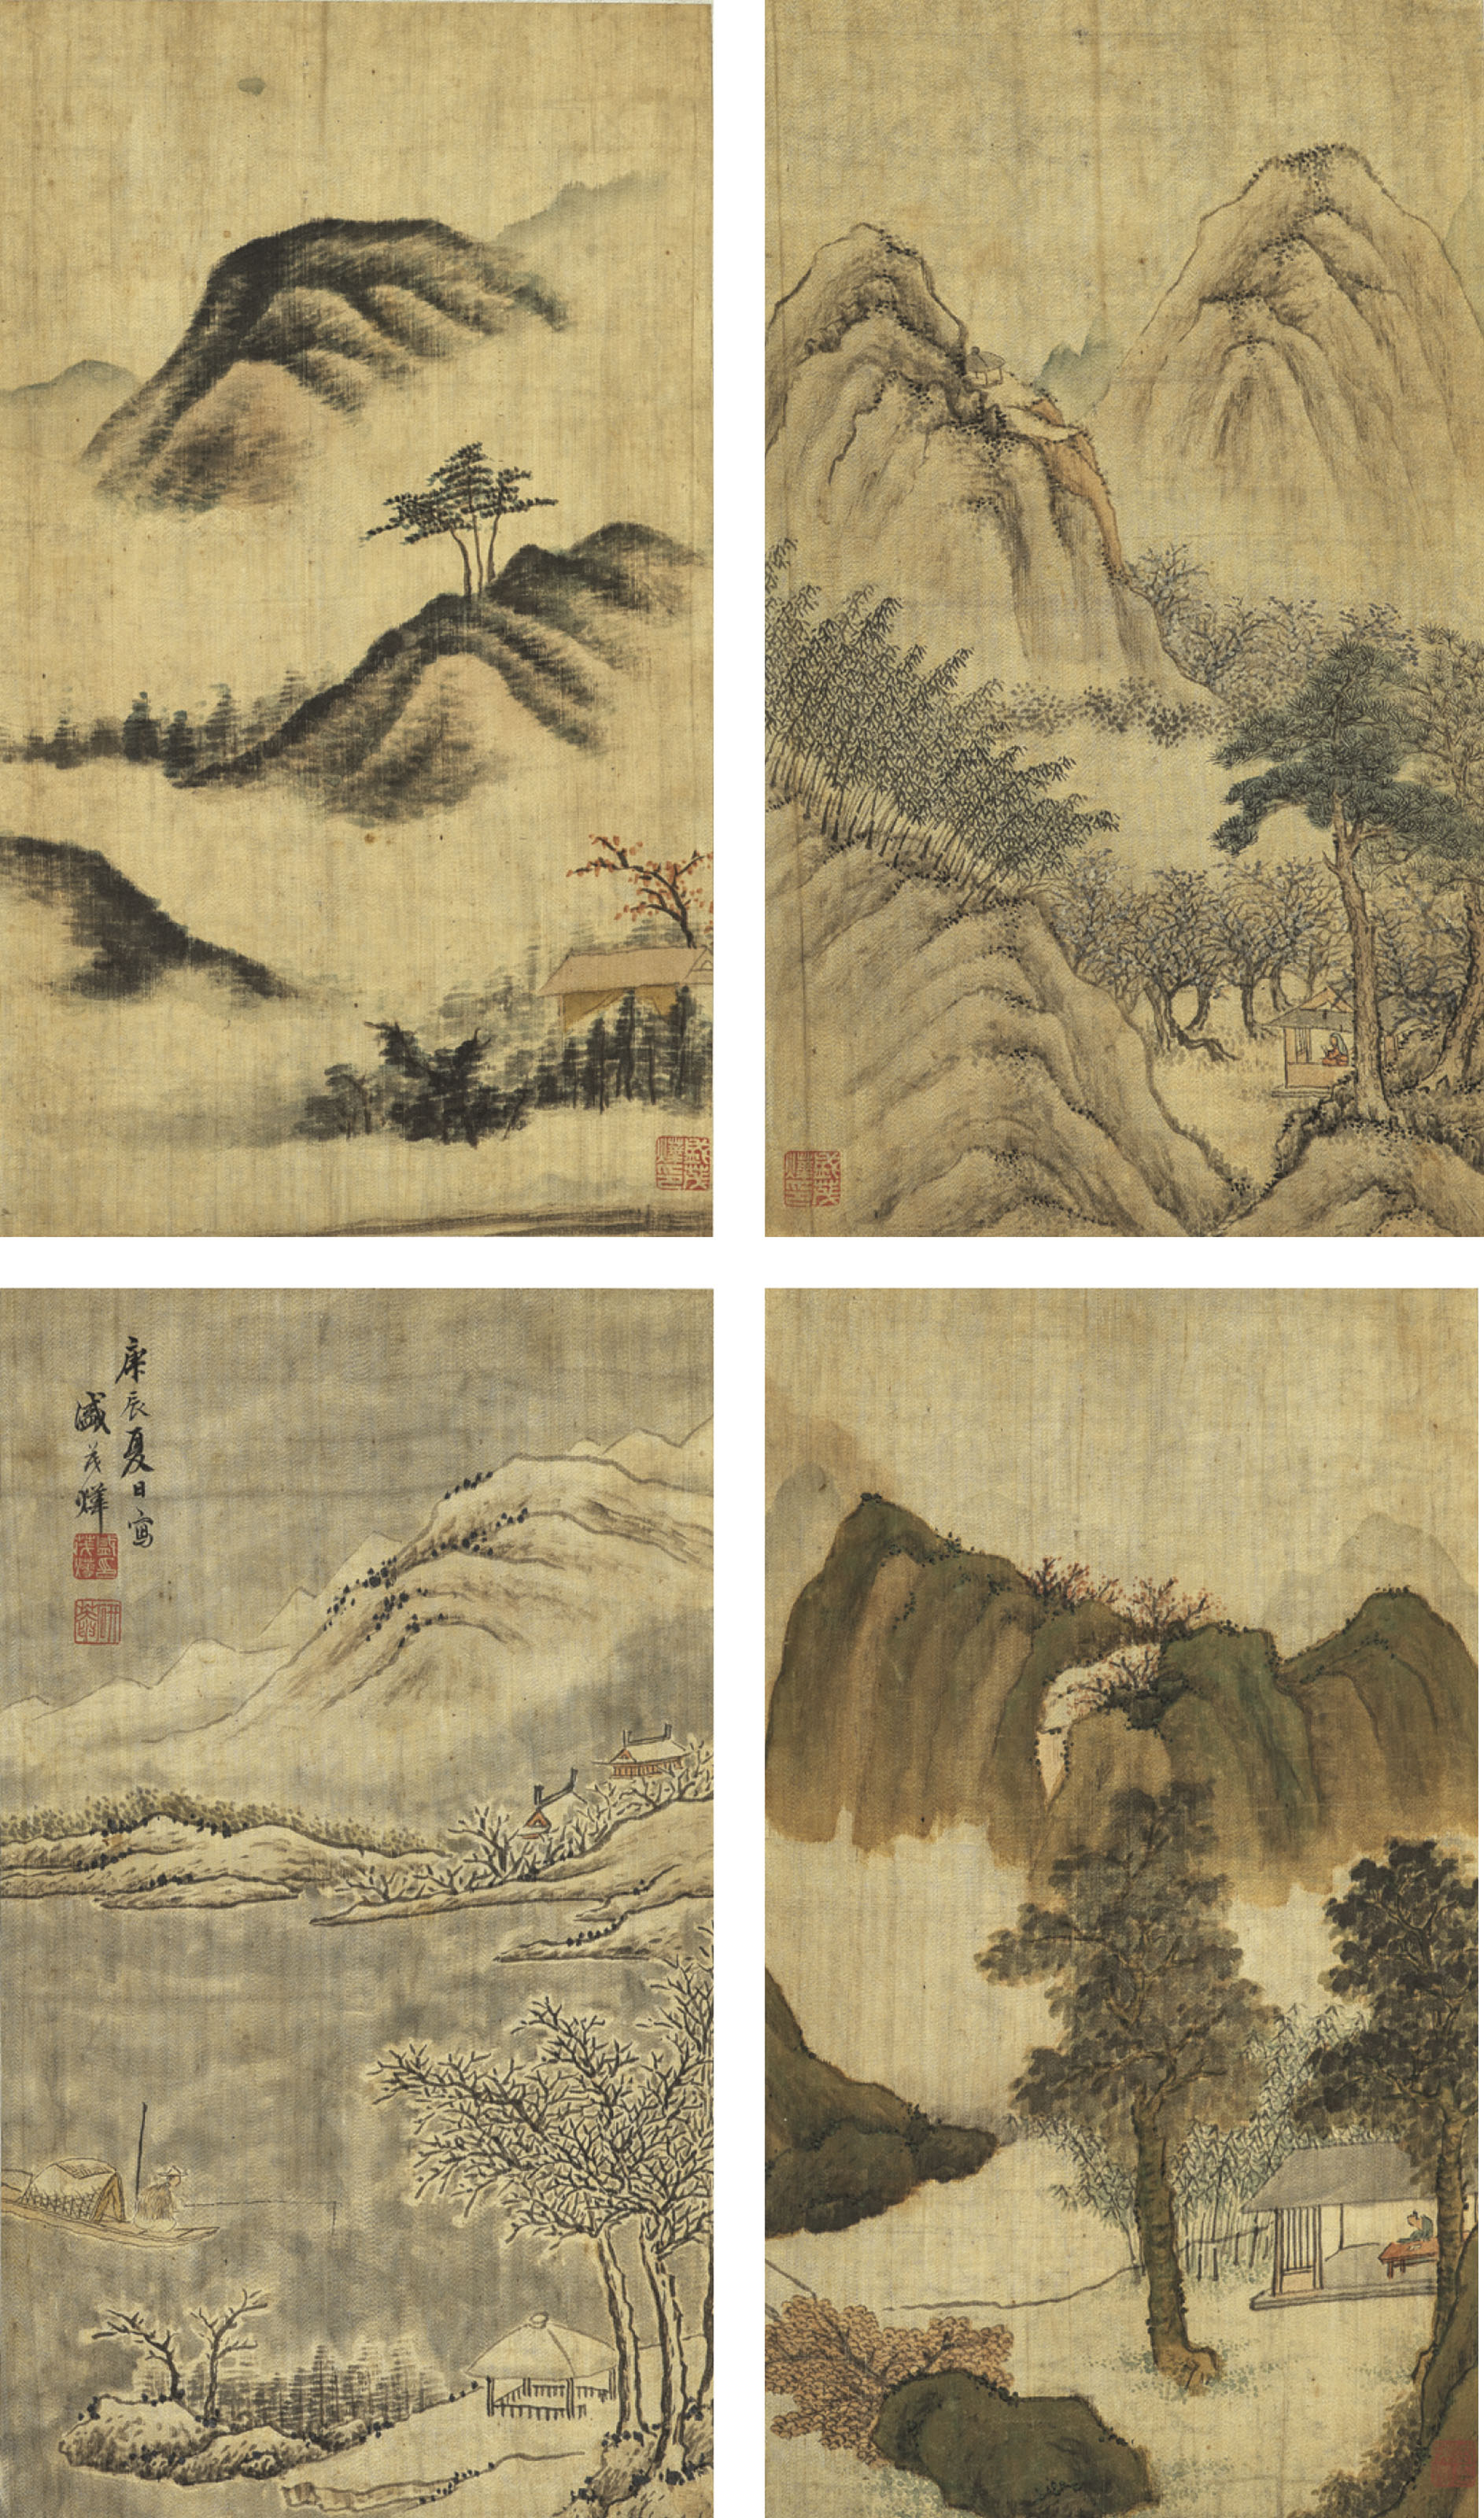 SHENG MAOYE (17TH CENTURY)